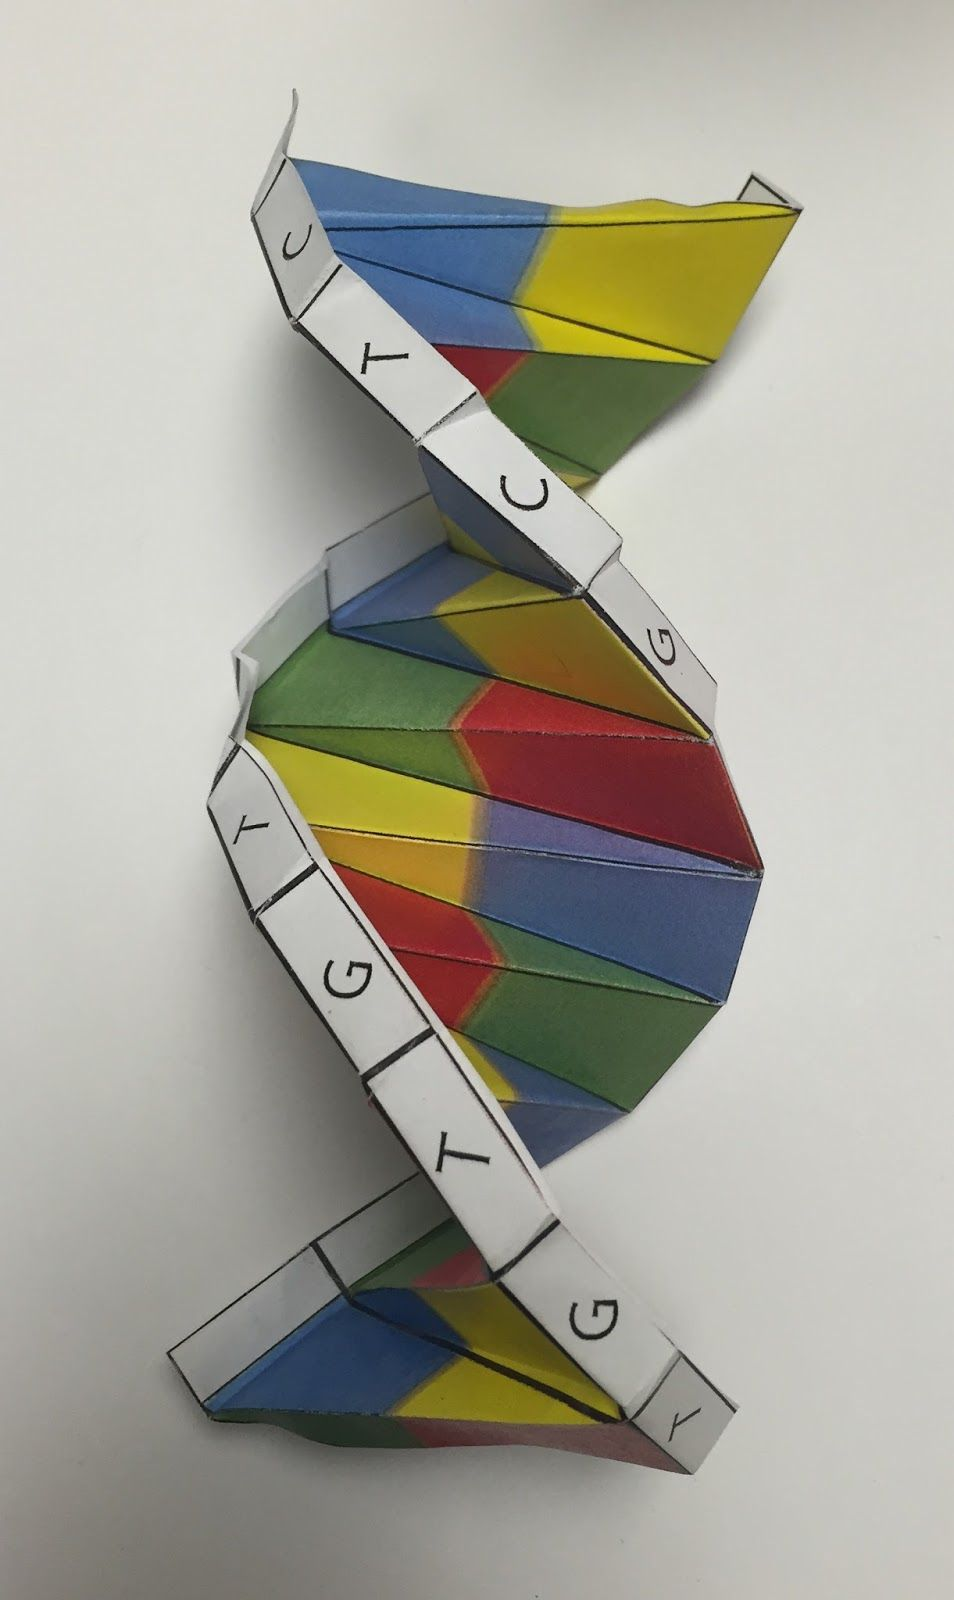 DNA Origami model | Genetics | Pinterest - photo#20